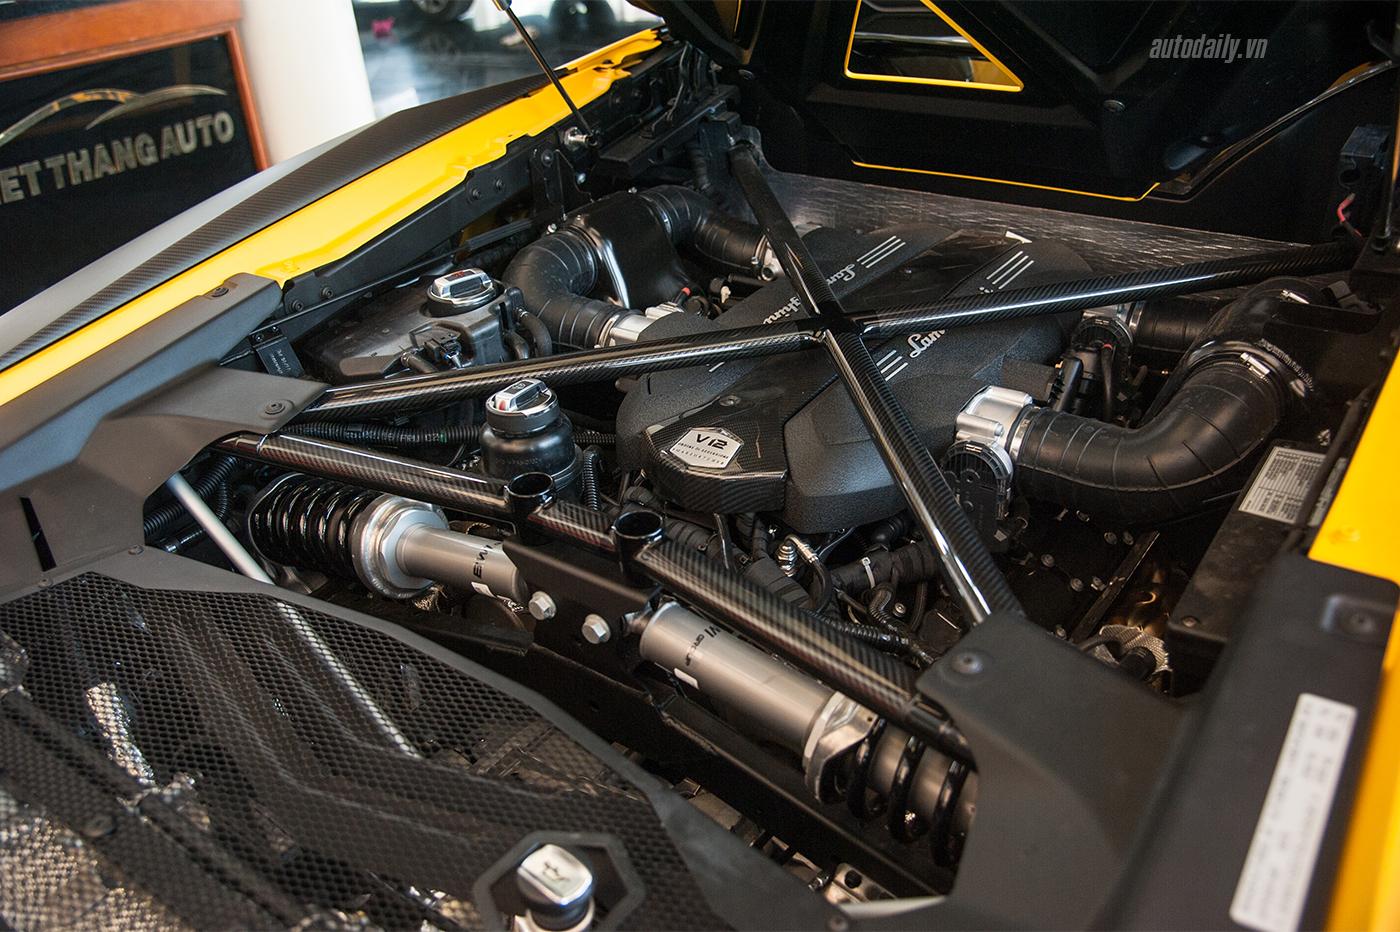 aventador-sv-roadster-1-13.jpg